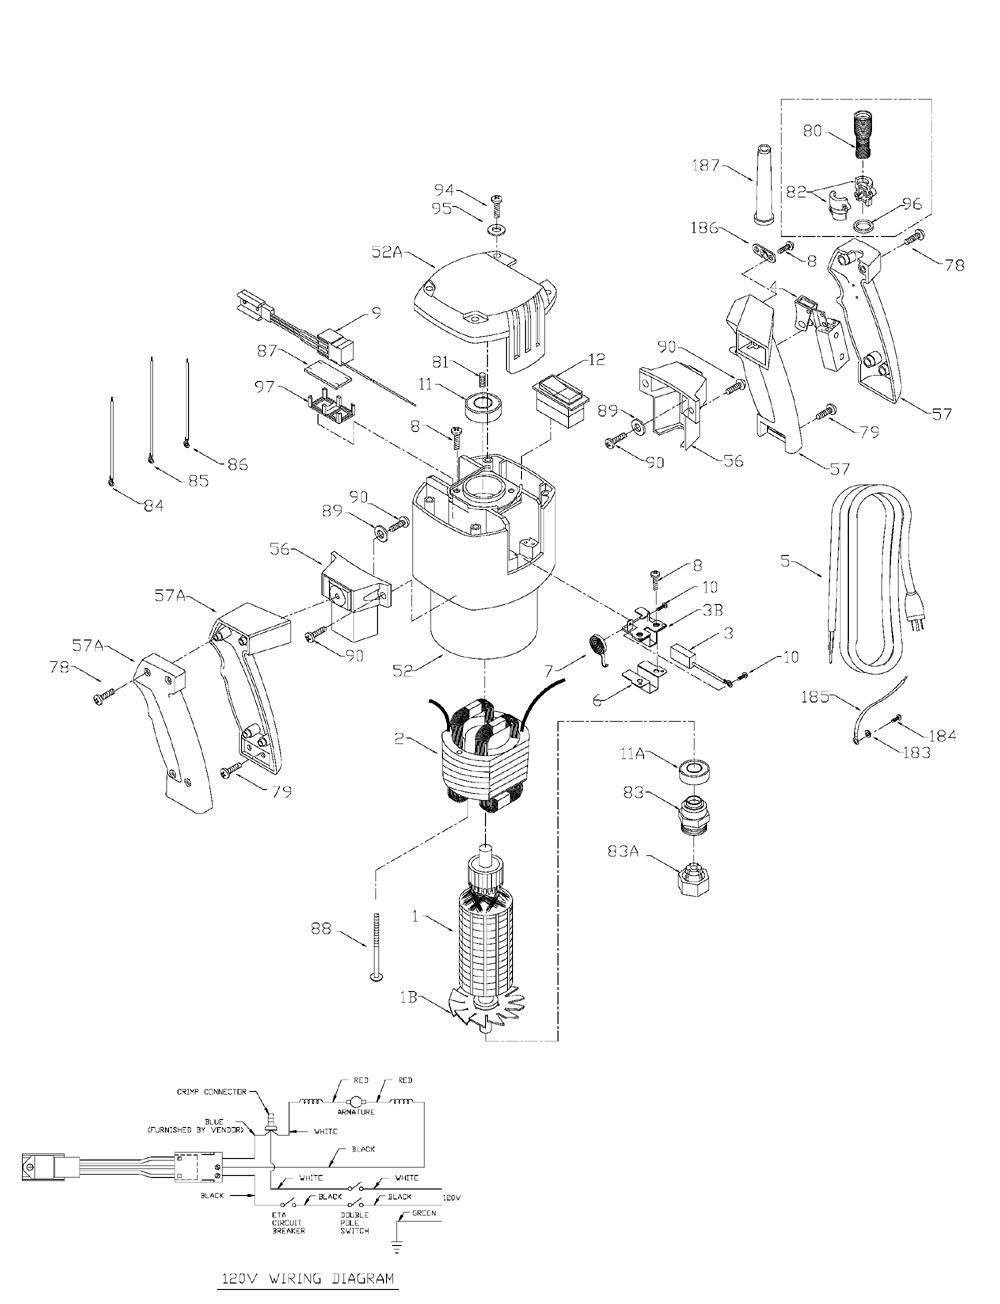 7538-portercable-T1-PB-1Break Down